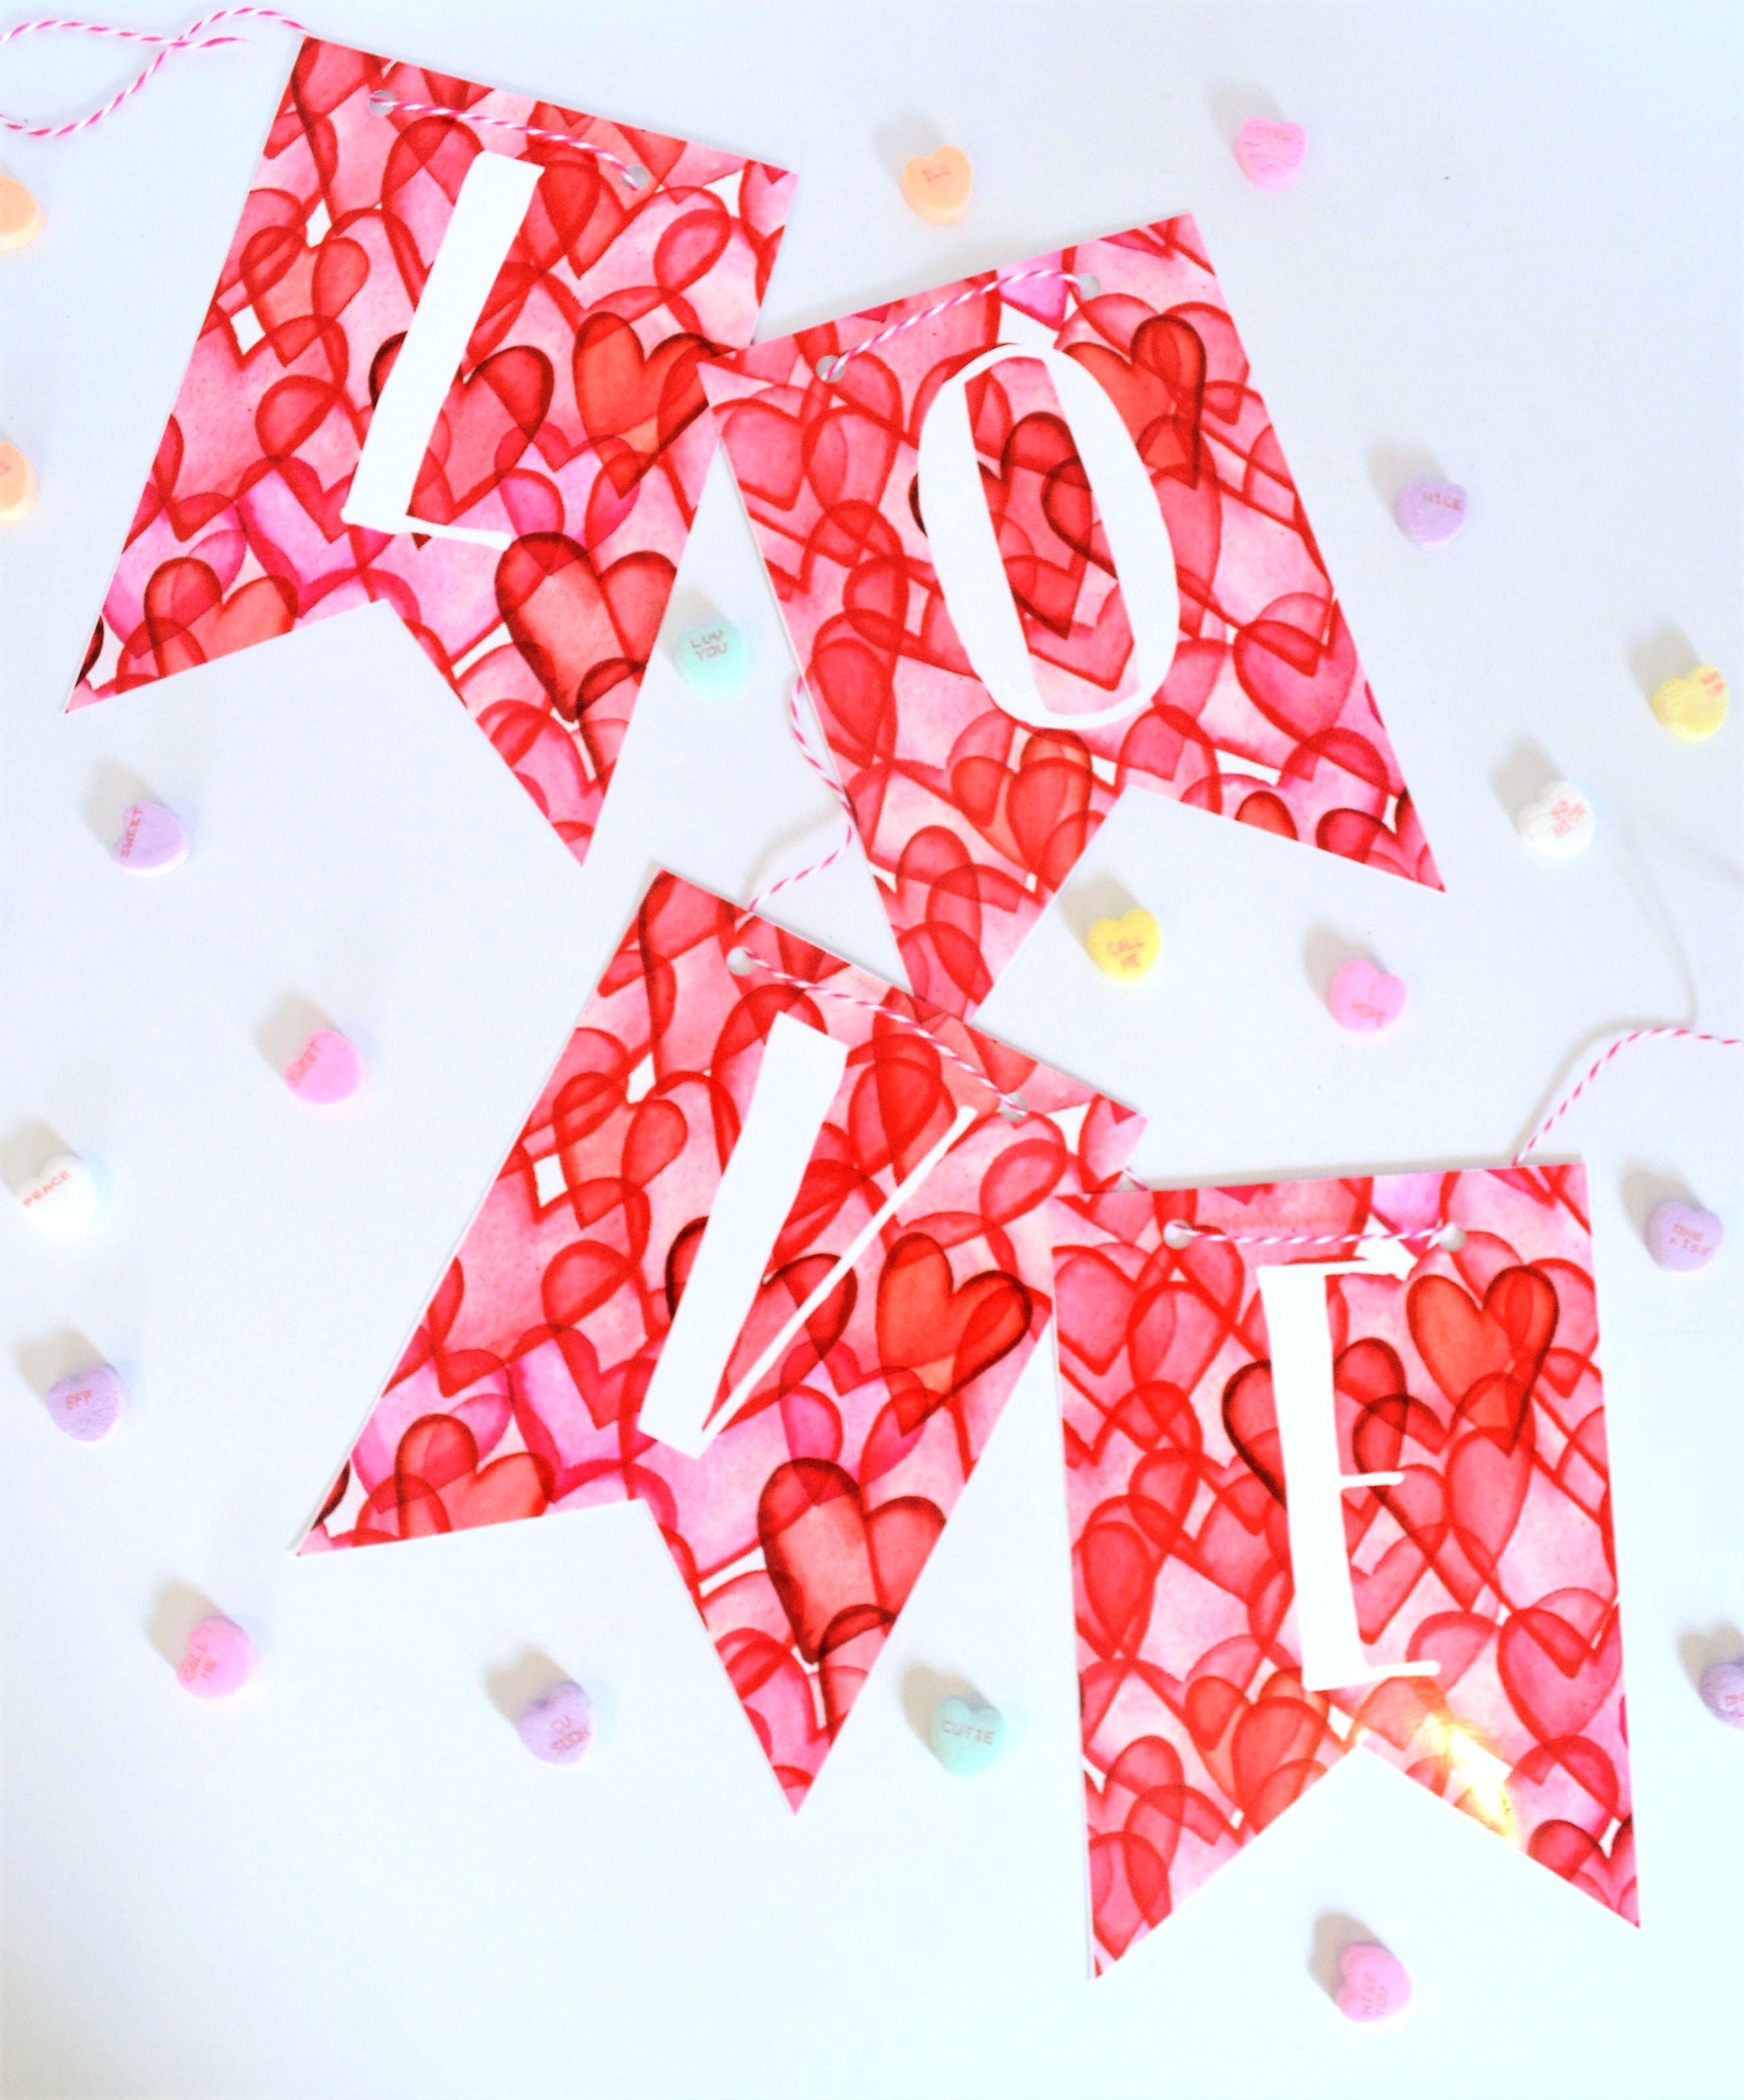 Raining Hearts Valentine S Day Printable